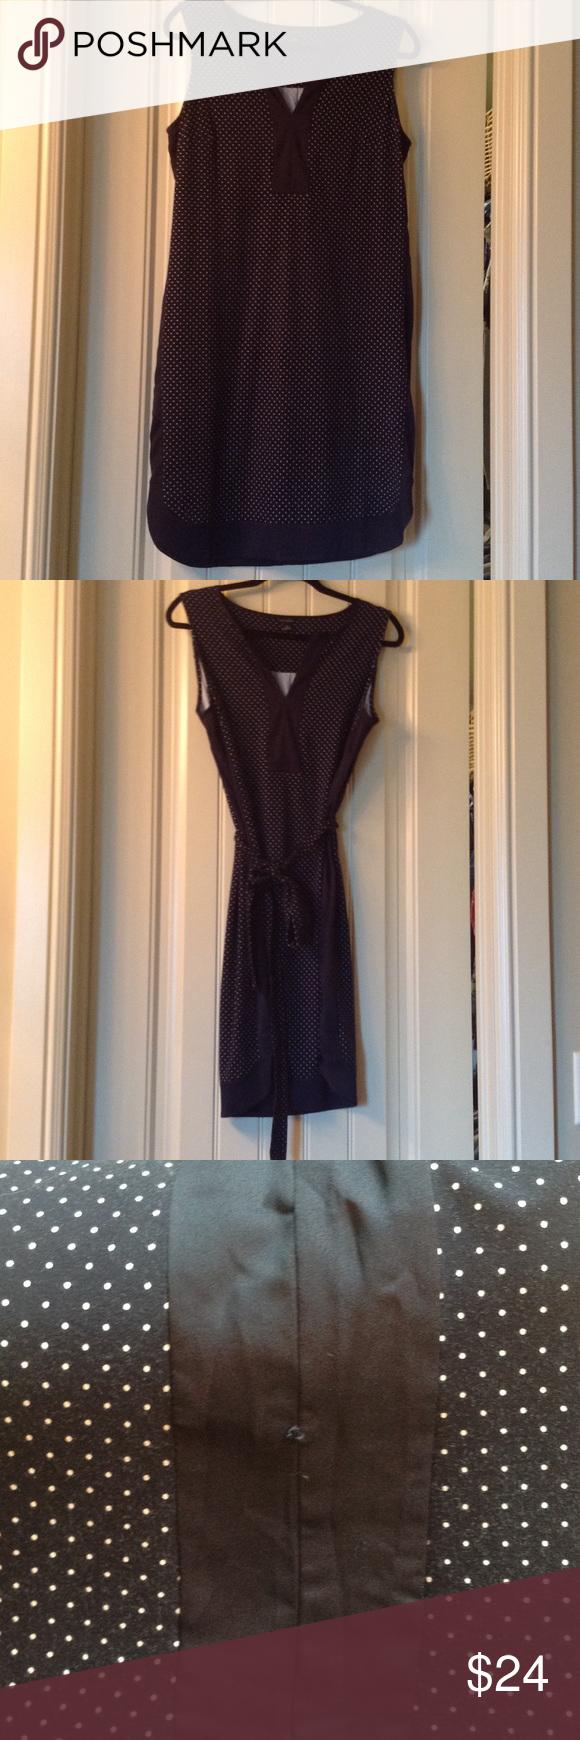 Ann taylor navy dress dark navy and white dots rayon